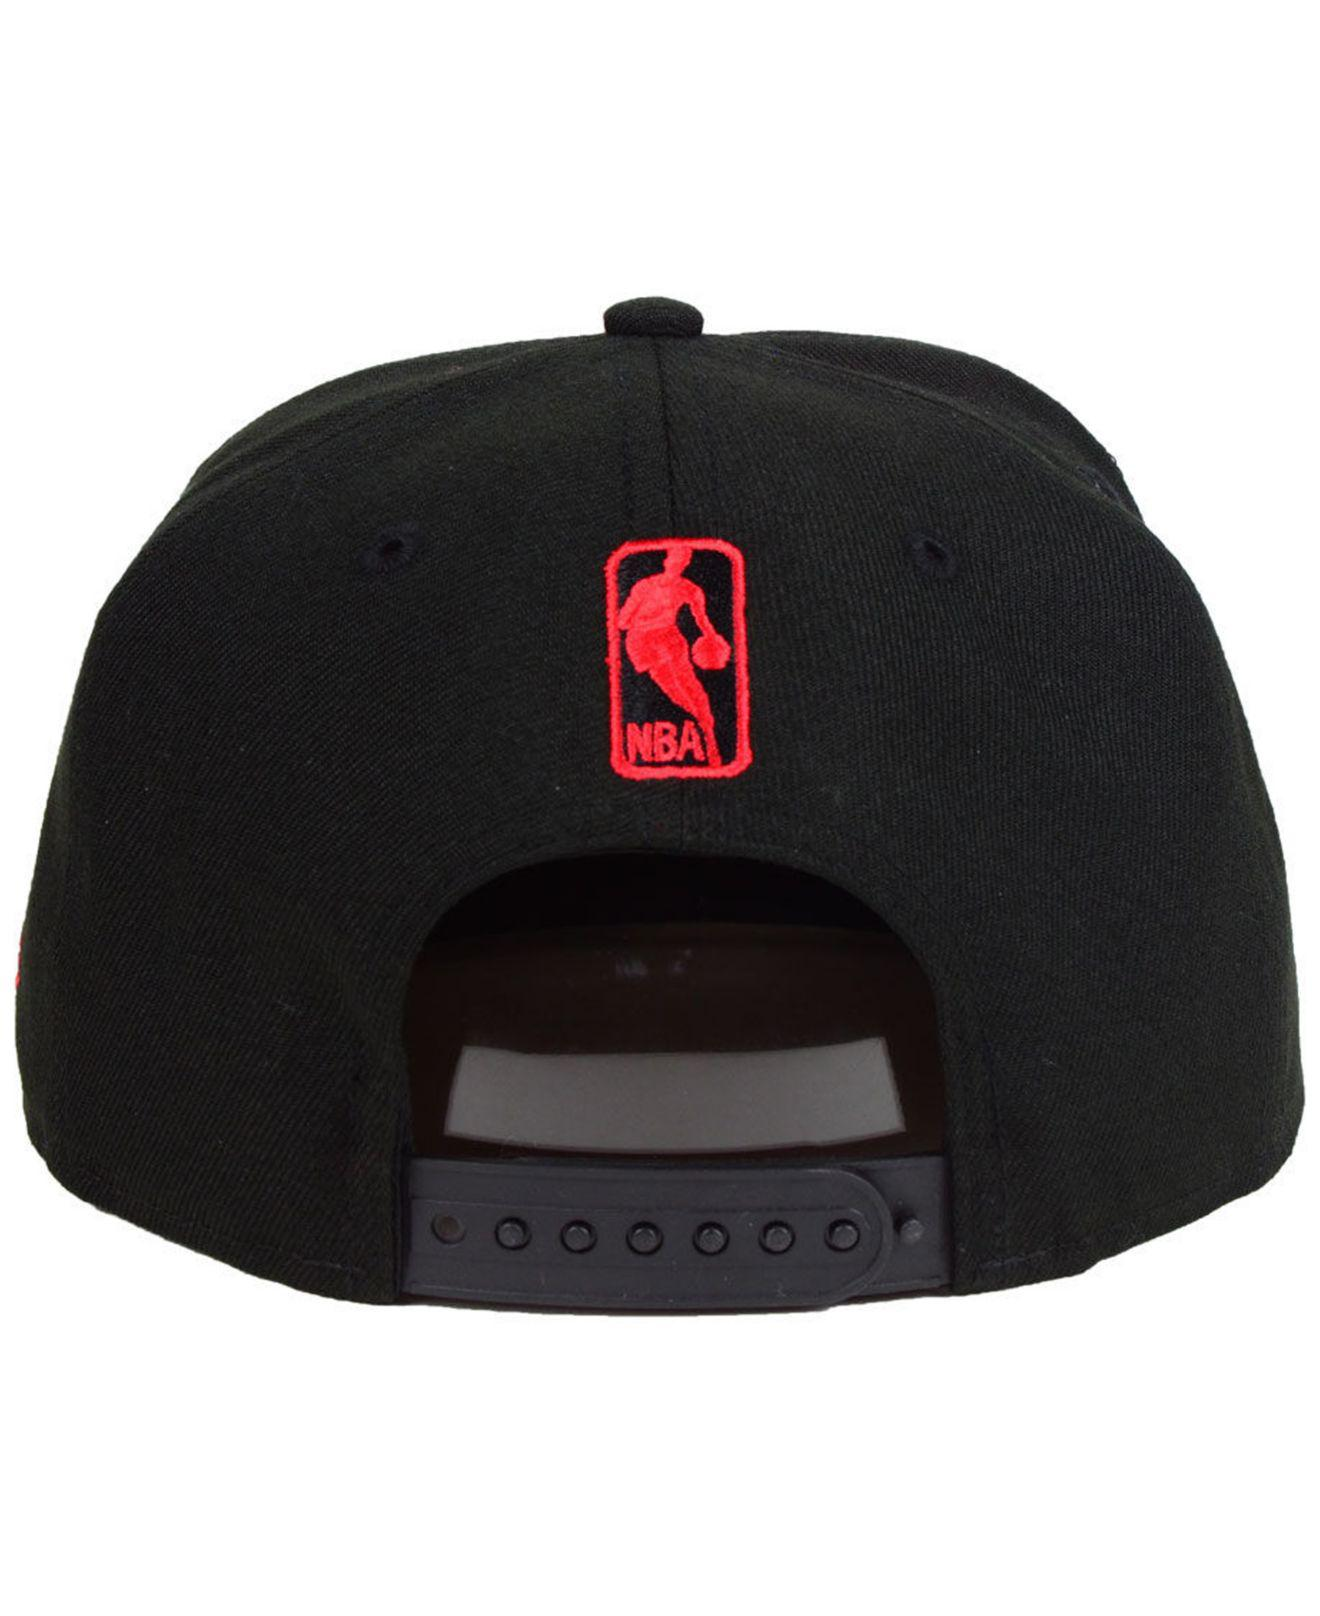 huge discount 4e5f8 4c9b6 Lyst - KTZ Los Angeles Clippers Circular 9fifty Snapback Cap in Black for  Men